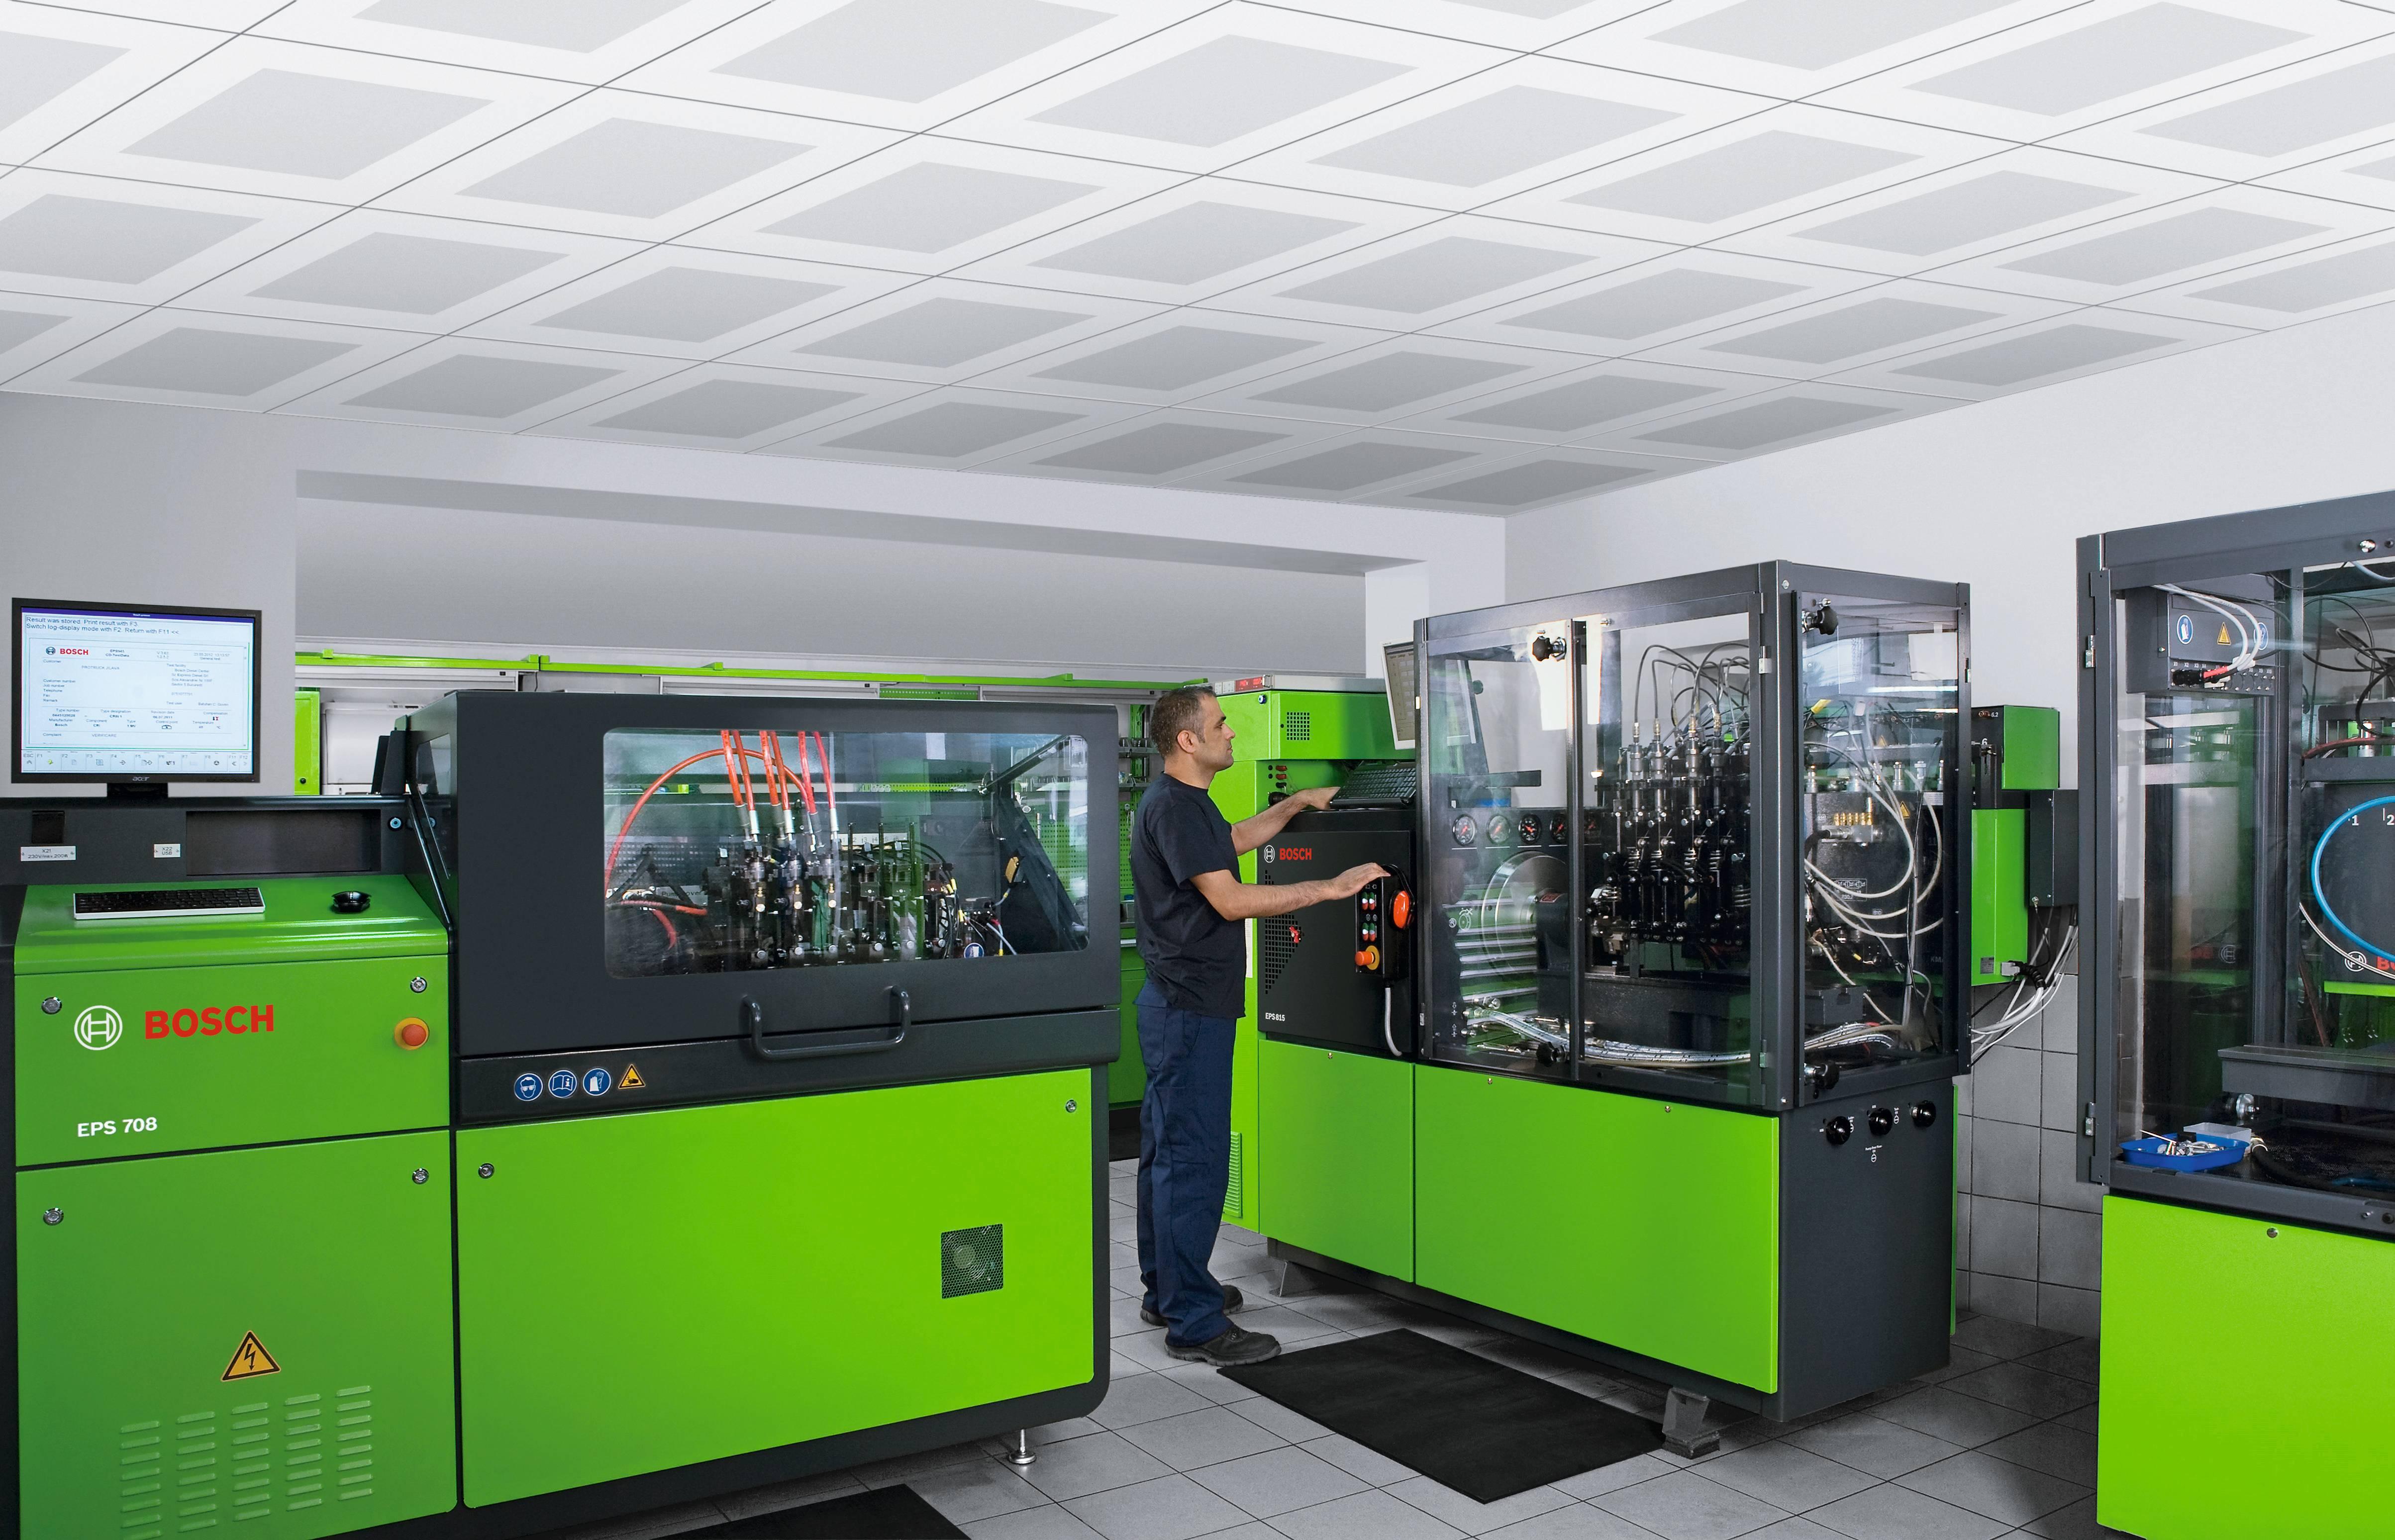 Tanta tecnologia Bosch esposta ad Automechanika